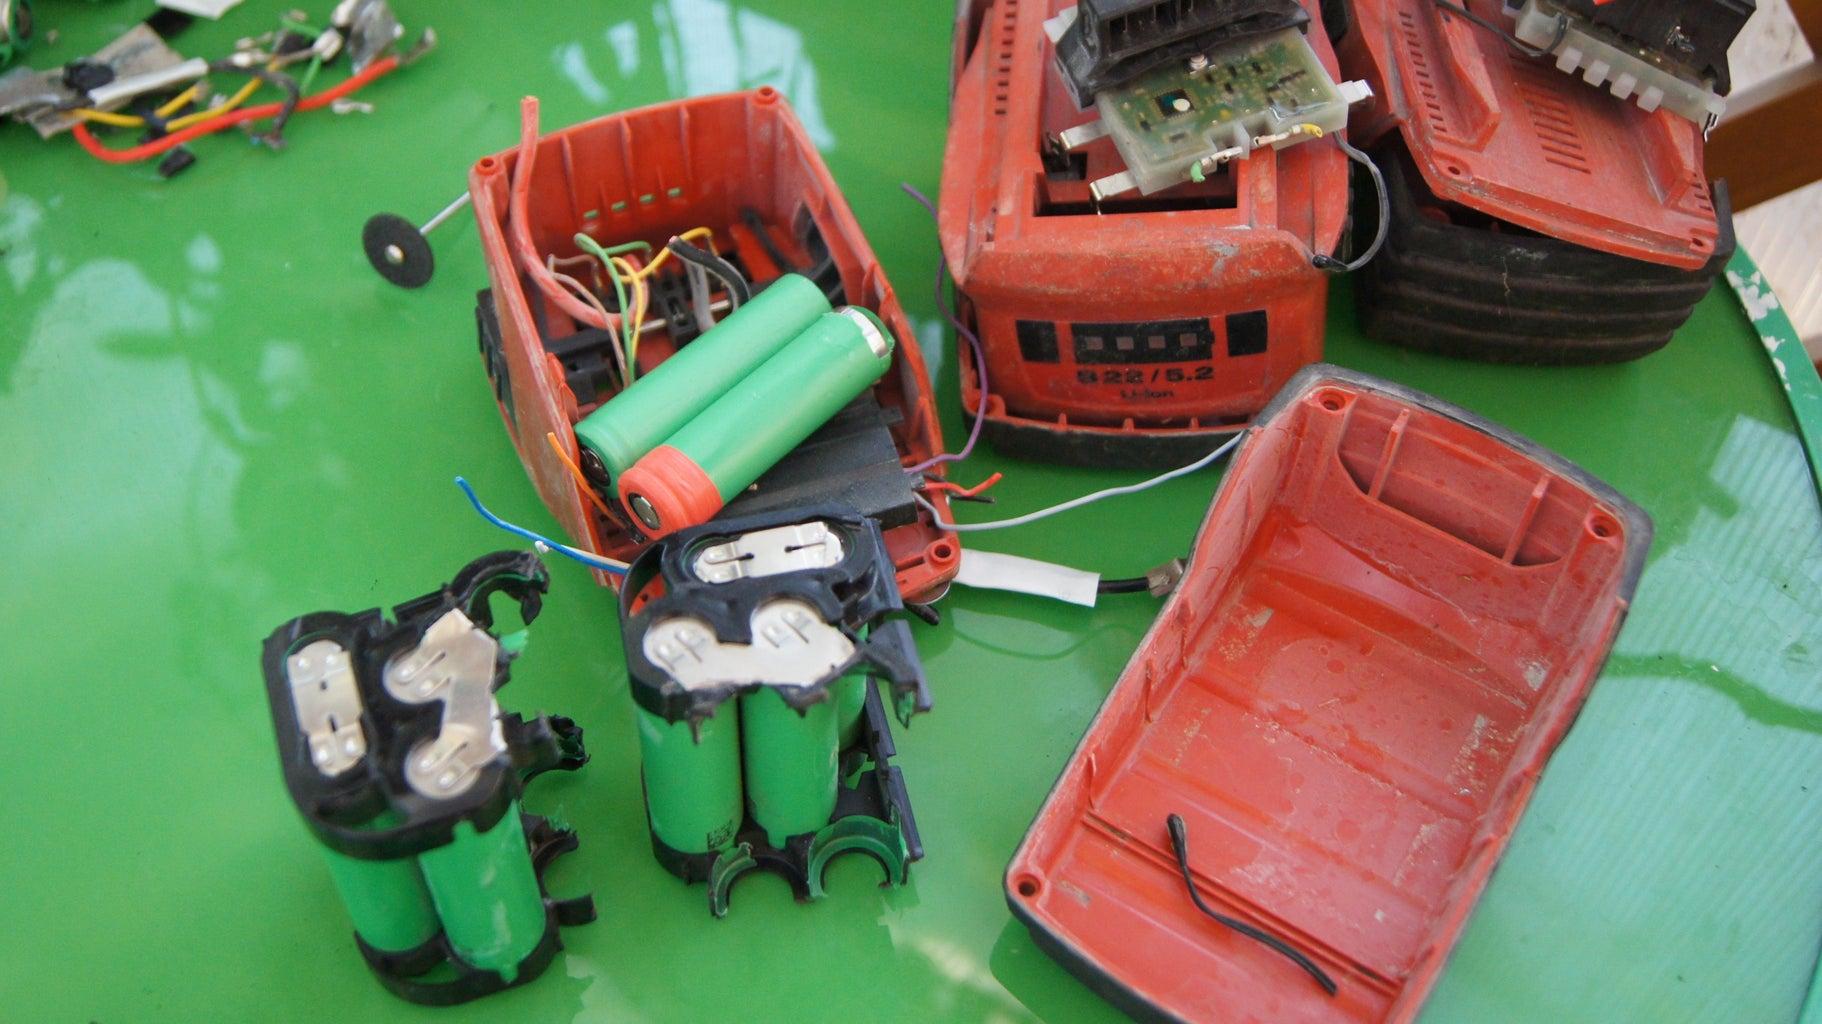 Prepare for Wiring